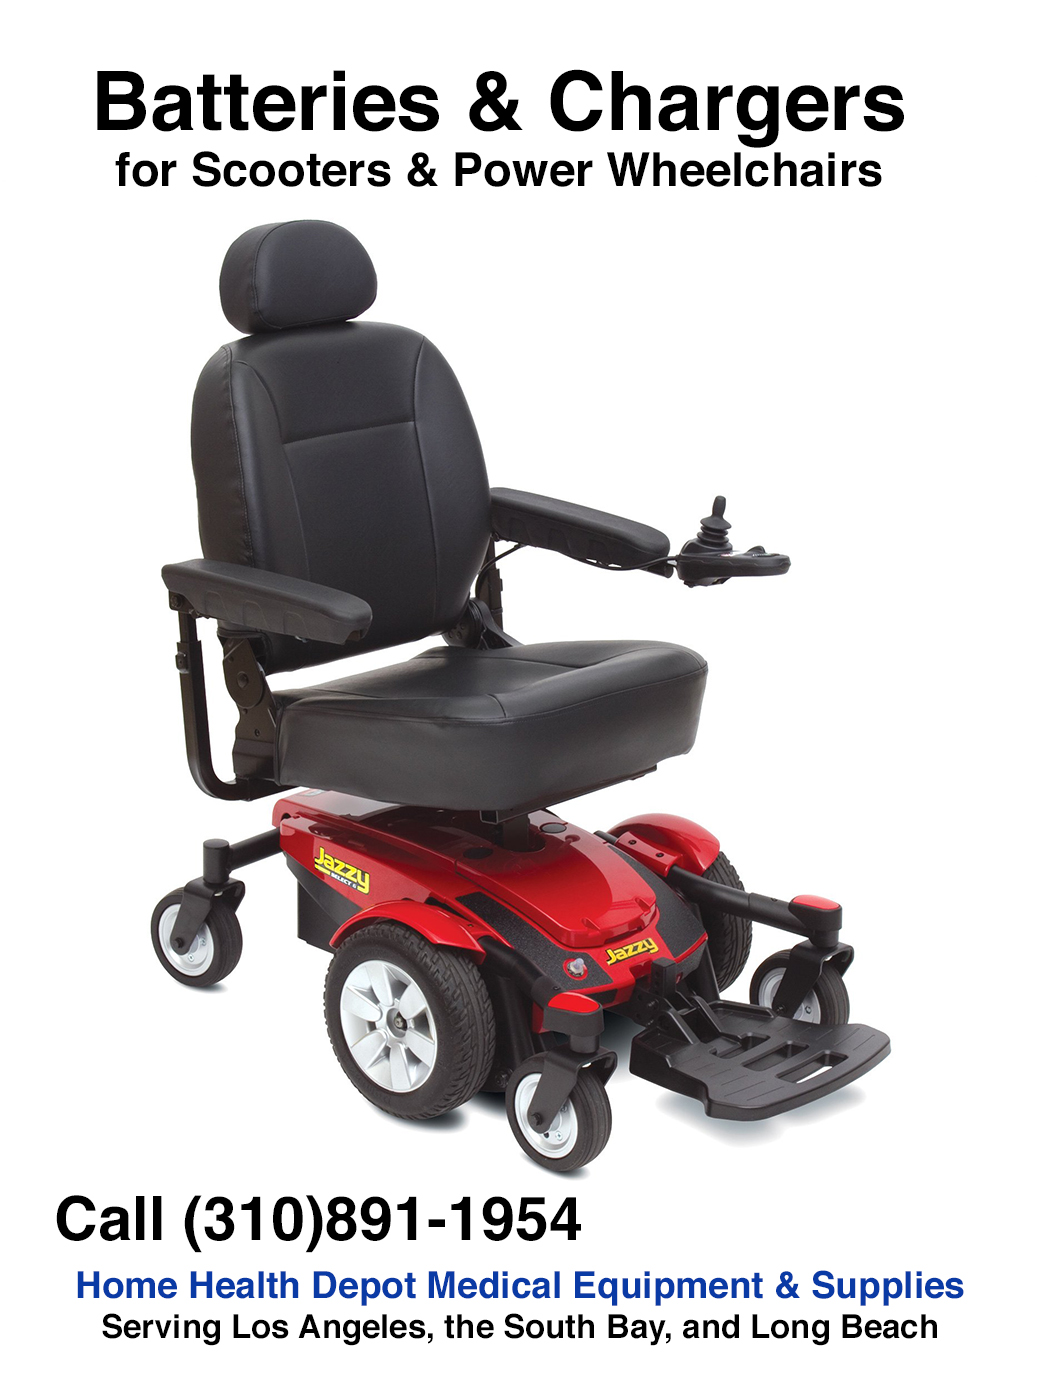 Battery & Charger | Mobility Scooter & Power Wheelchair Batteries | Los Angeles, South Bay, Carson, Torrance, San Pedro, Palos Verdes, Santa Monica, Lomita, Long Beach, Redondo Beach, Harbor City, Compton, Gardena, Hawthorne, Manhattan Beach, Segundo